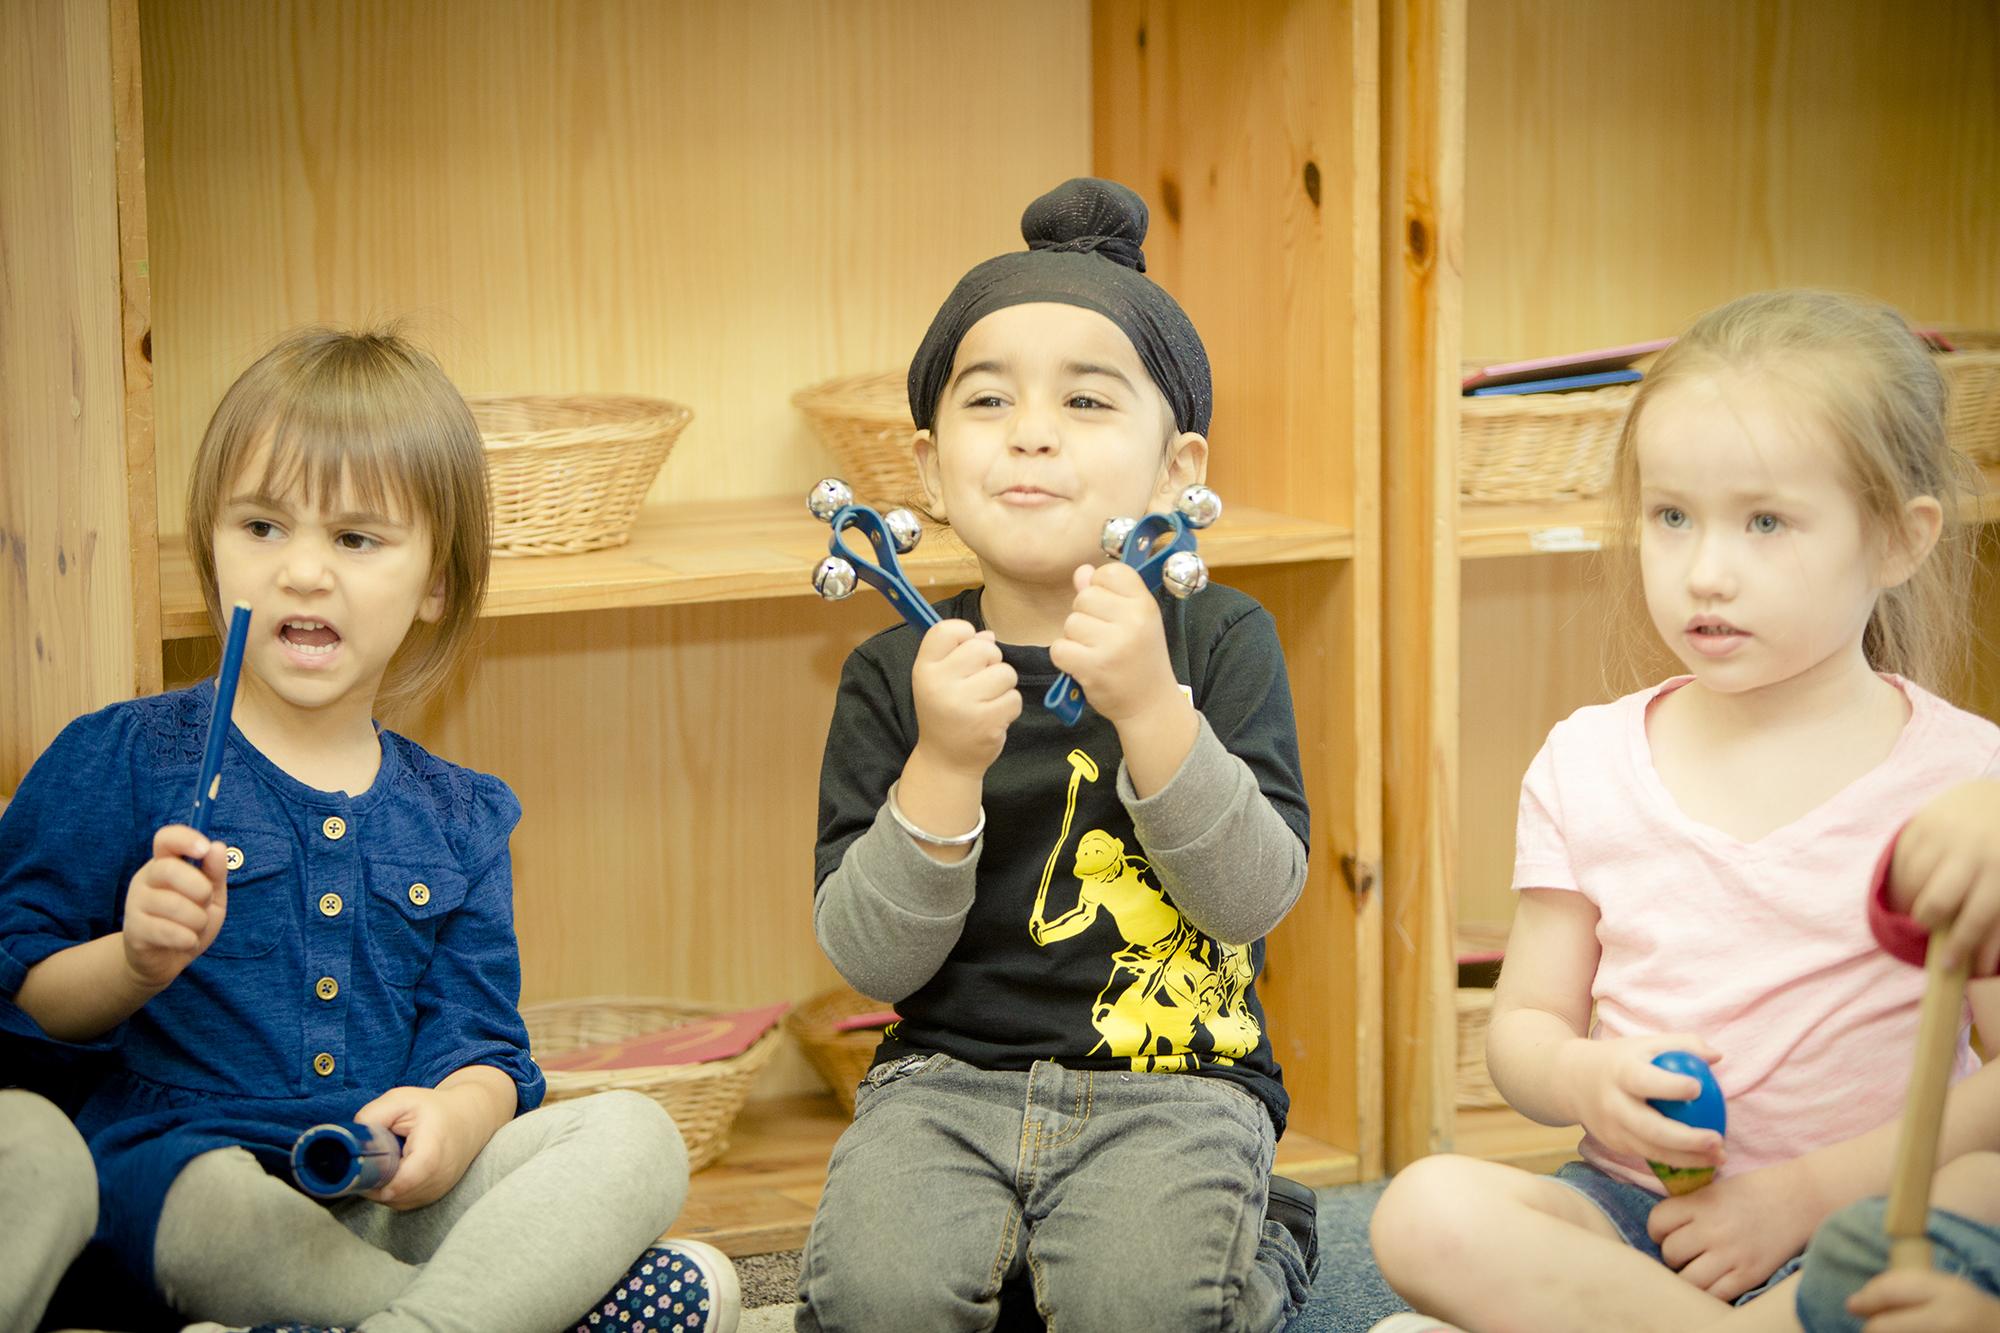 22d86db040 Mission Viejo Montessori Mission Viejo Montessori: Nurturing ...